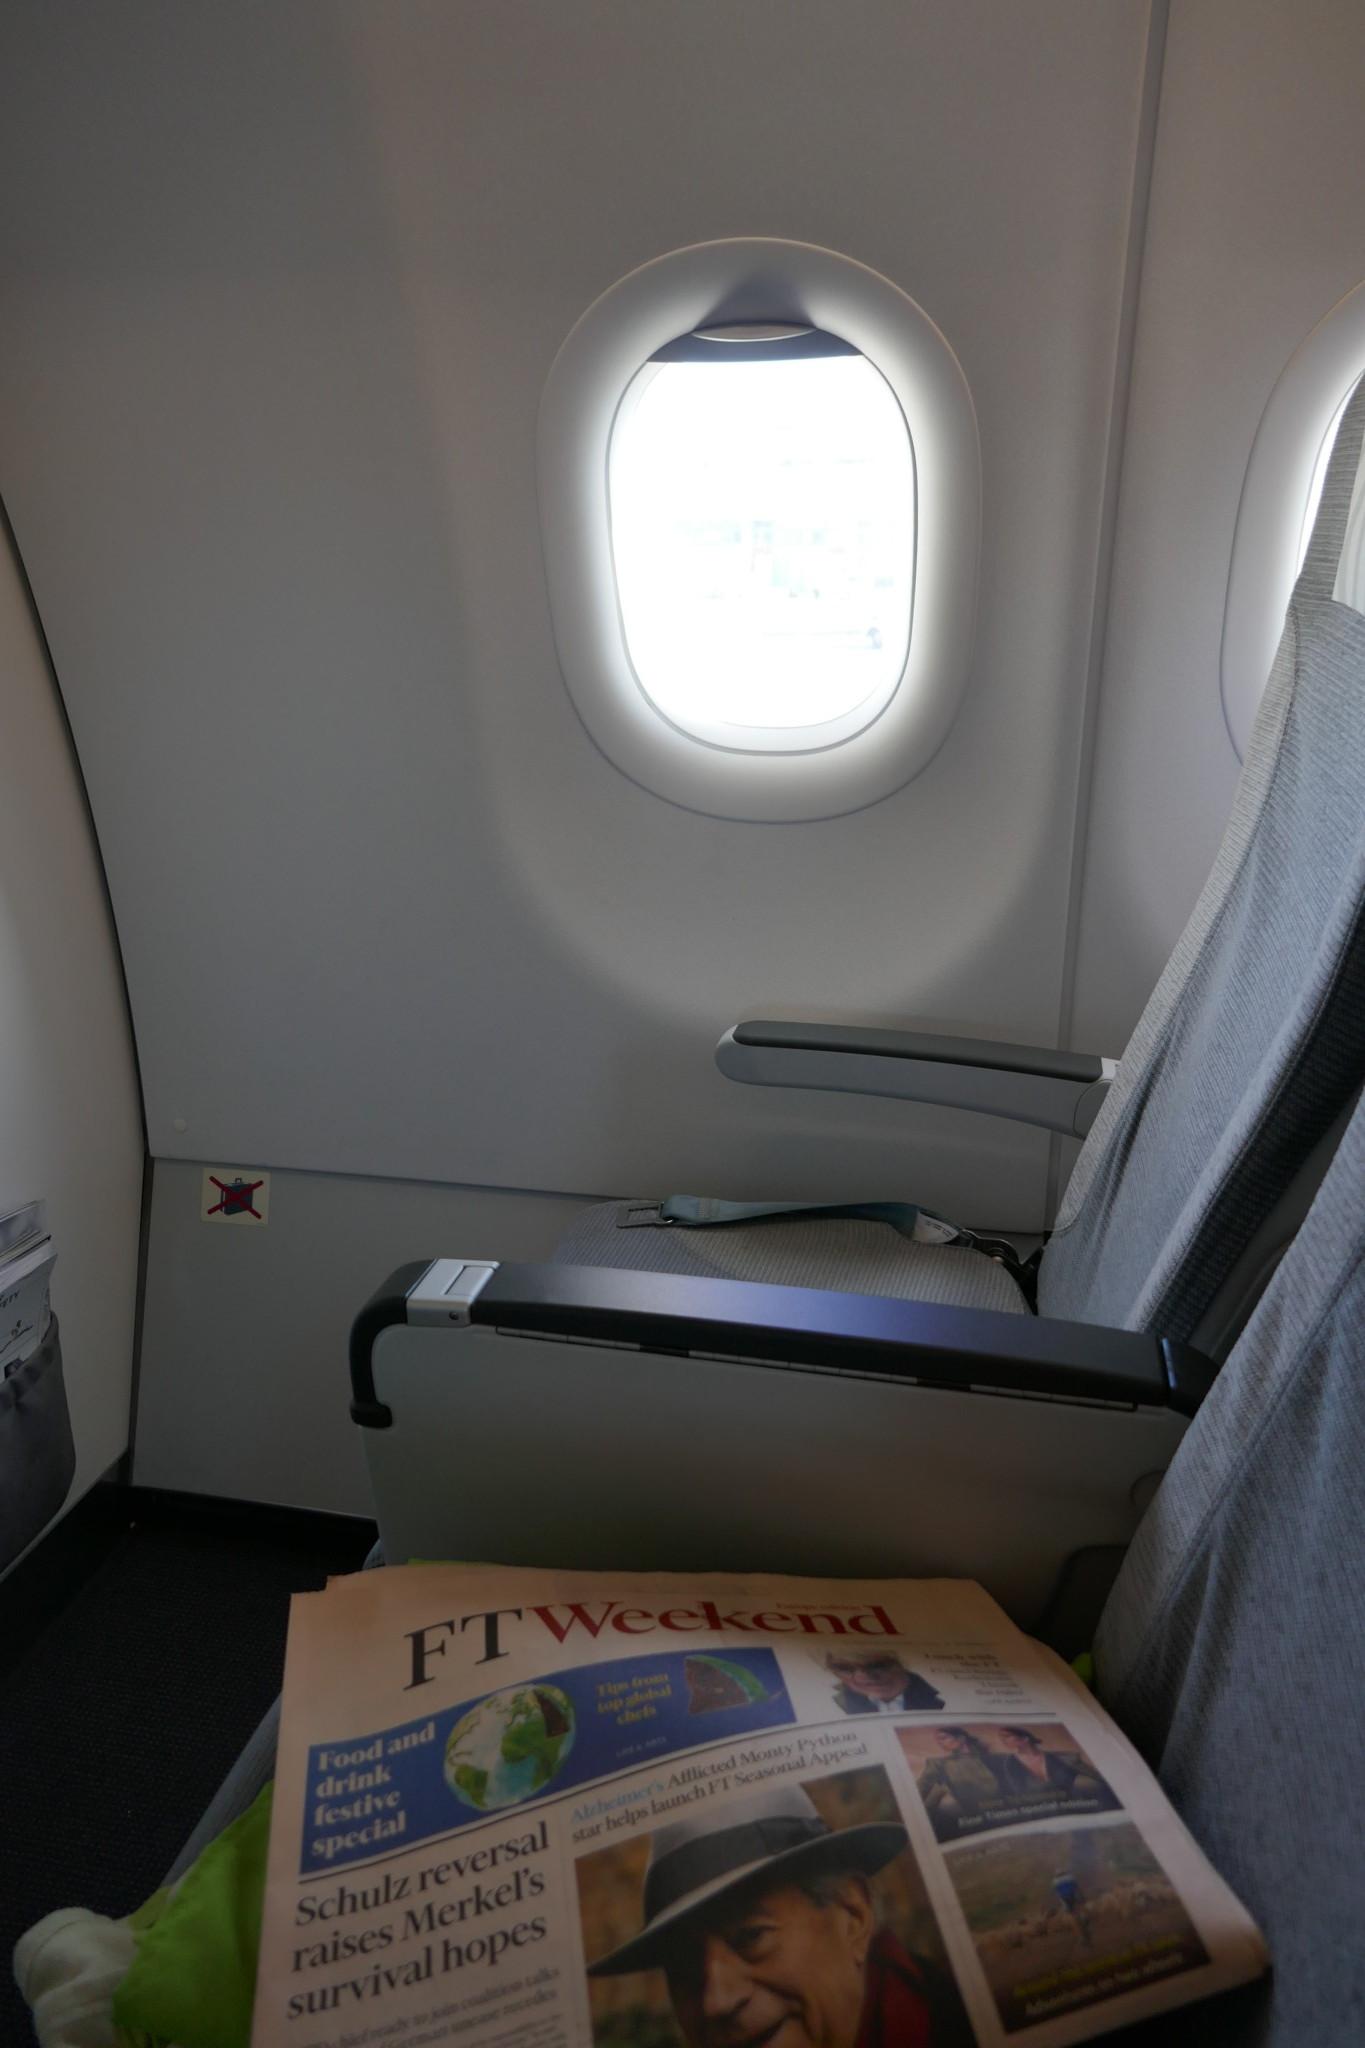 Finnair A320 Business Class bulkhead seat